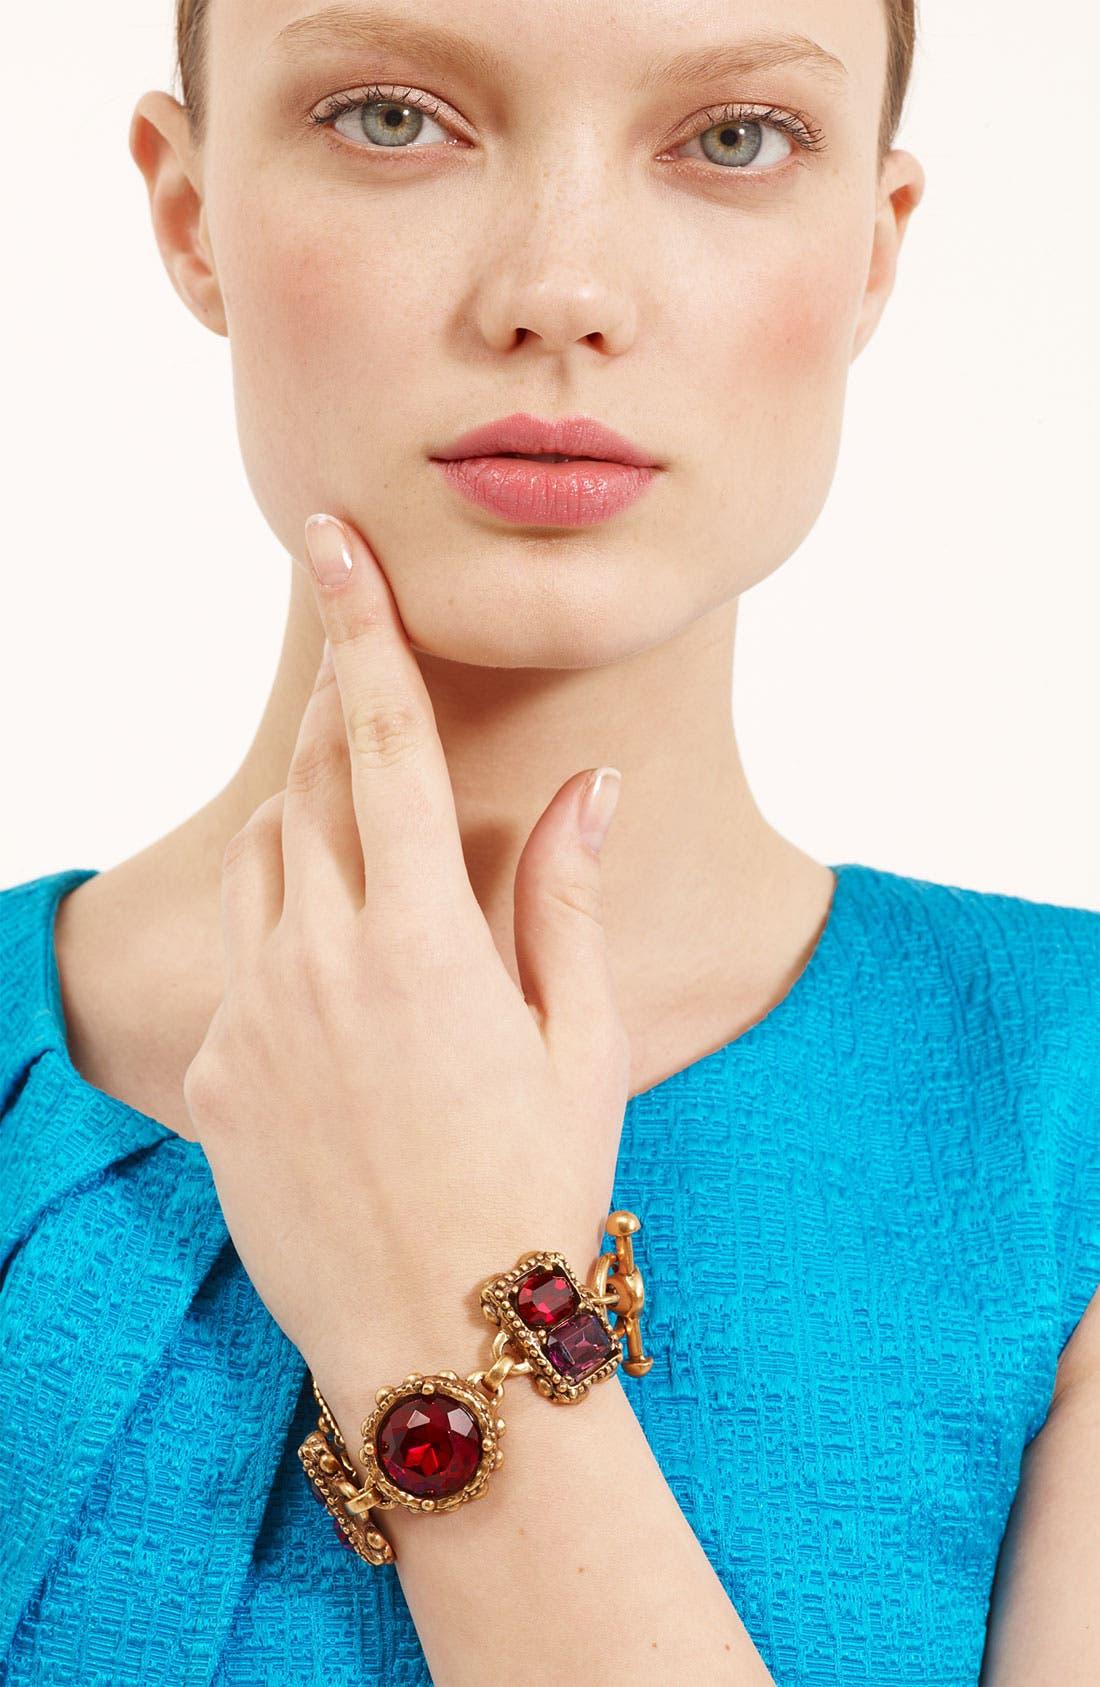 Alternate Image 1 Selected - Oscar de la Renta Faceted Stone Bracelet